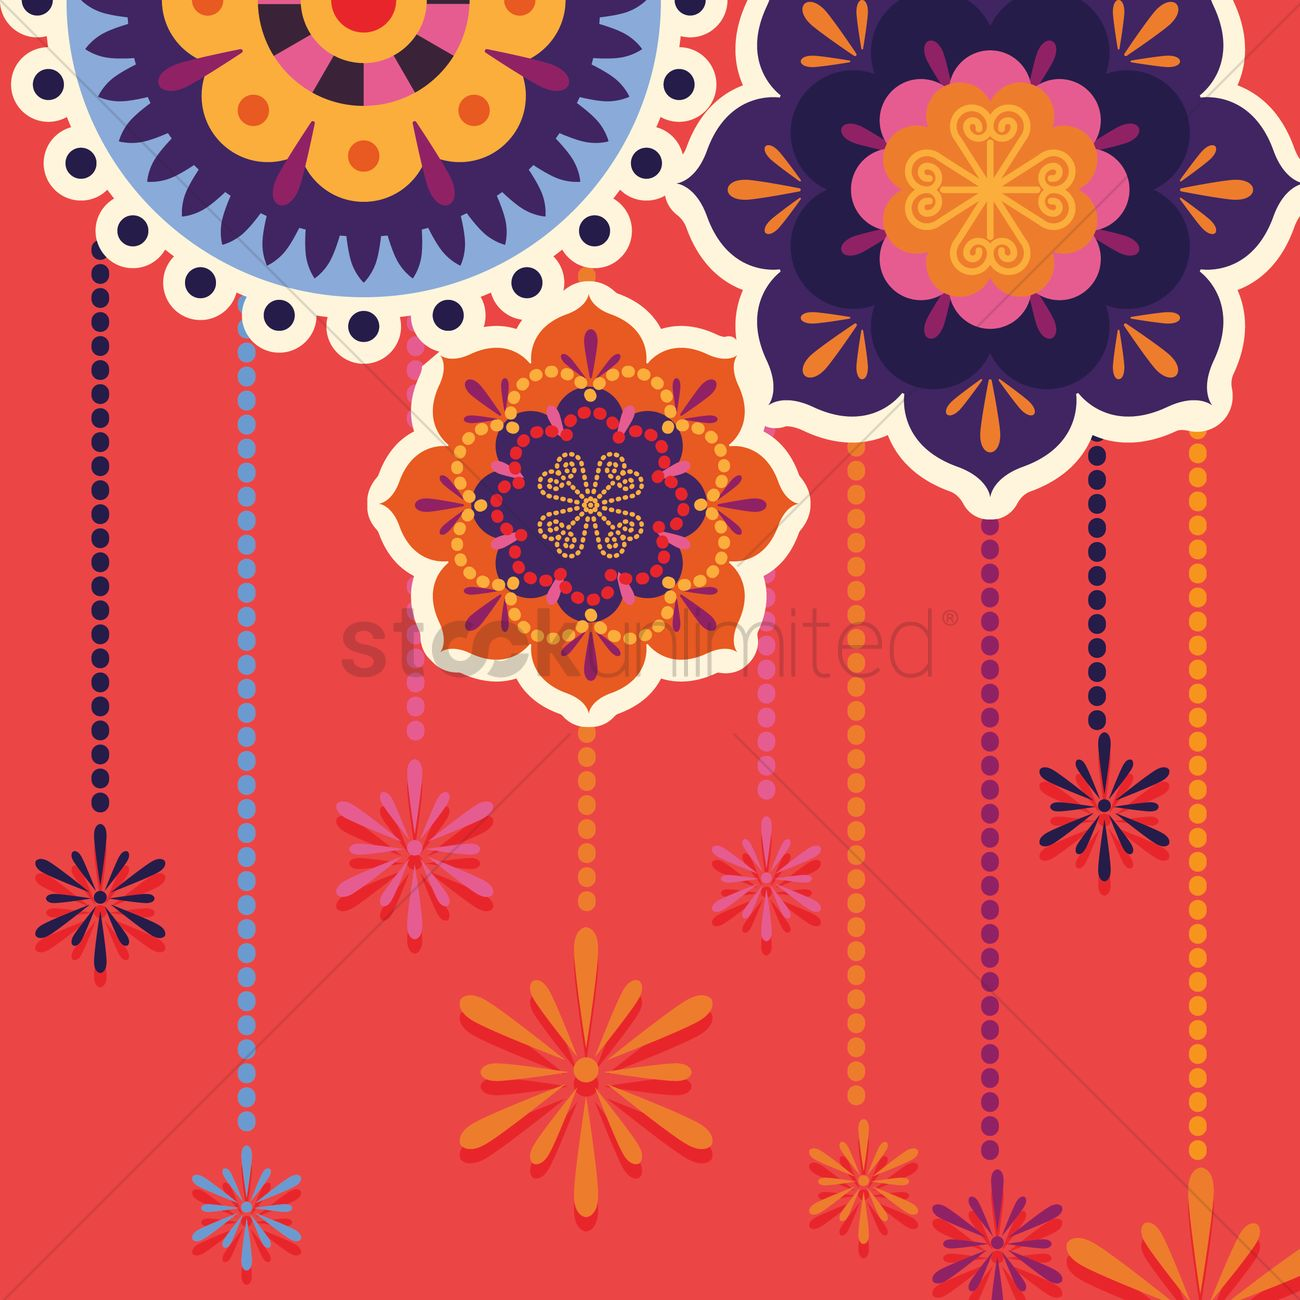 Colorful rangoli Vector Image - 1937453 | StockUnlimited for Flower Rangoli Vector  53kxo